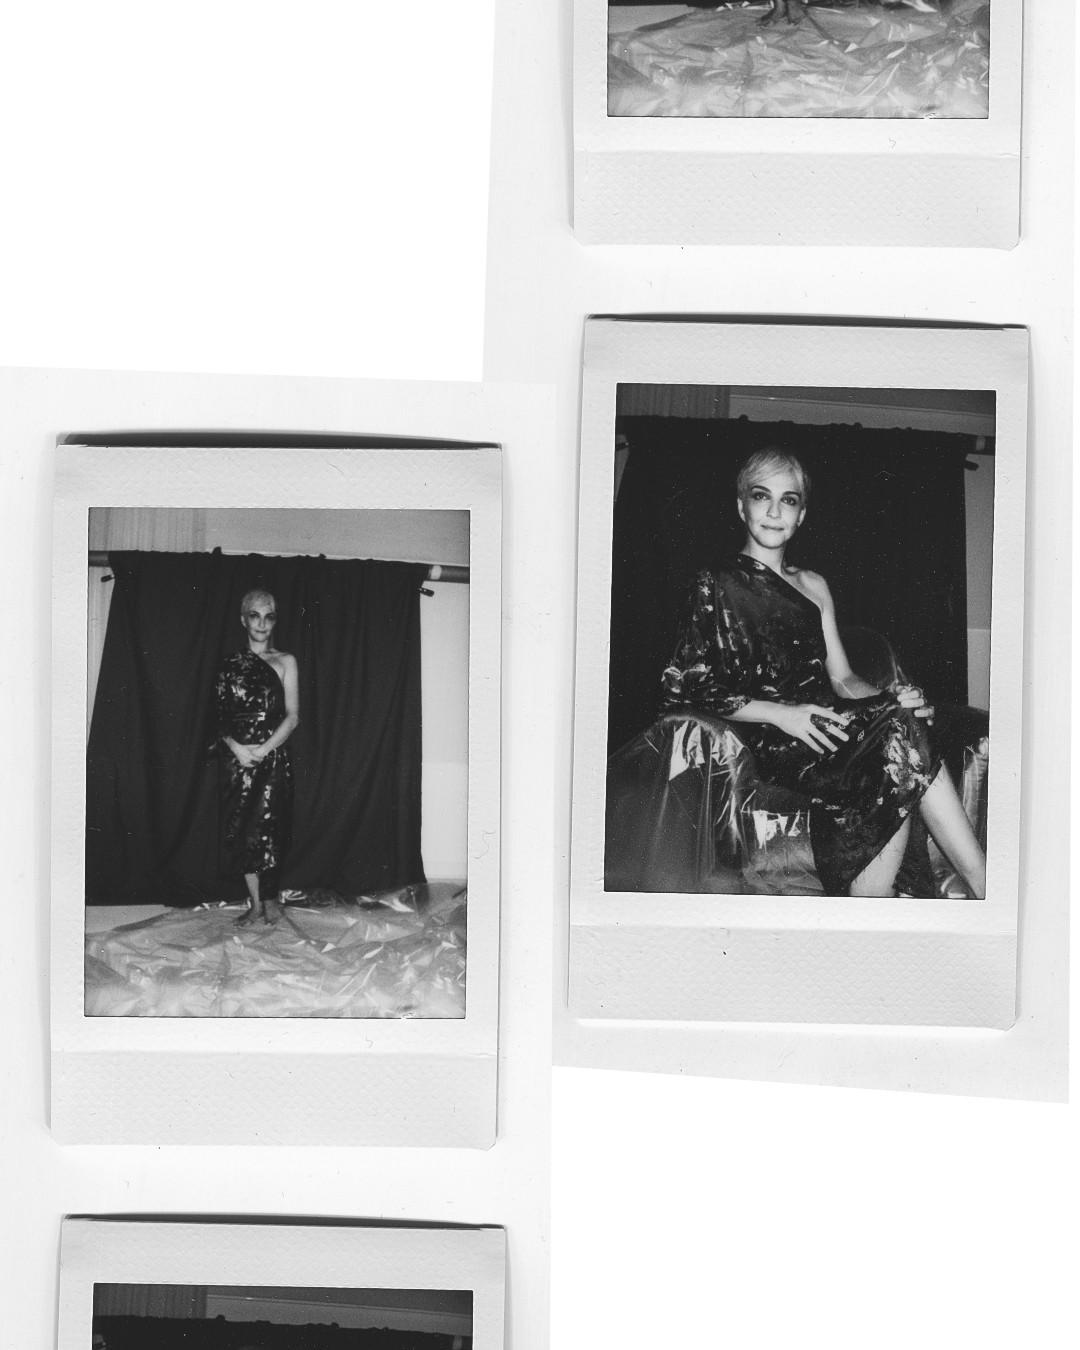 EDITORIAL Camila Cornelsen  (Foto: Camila Cornelsen, com styling por Gisah Ramos e beleza por Laura La Laina)